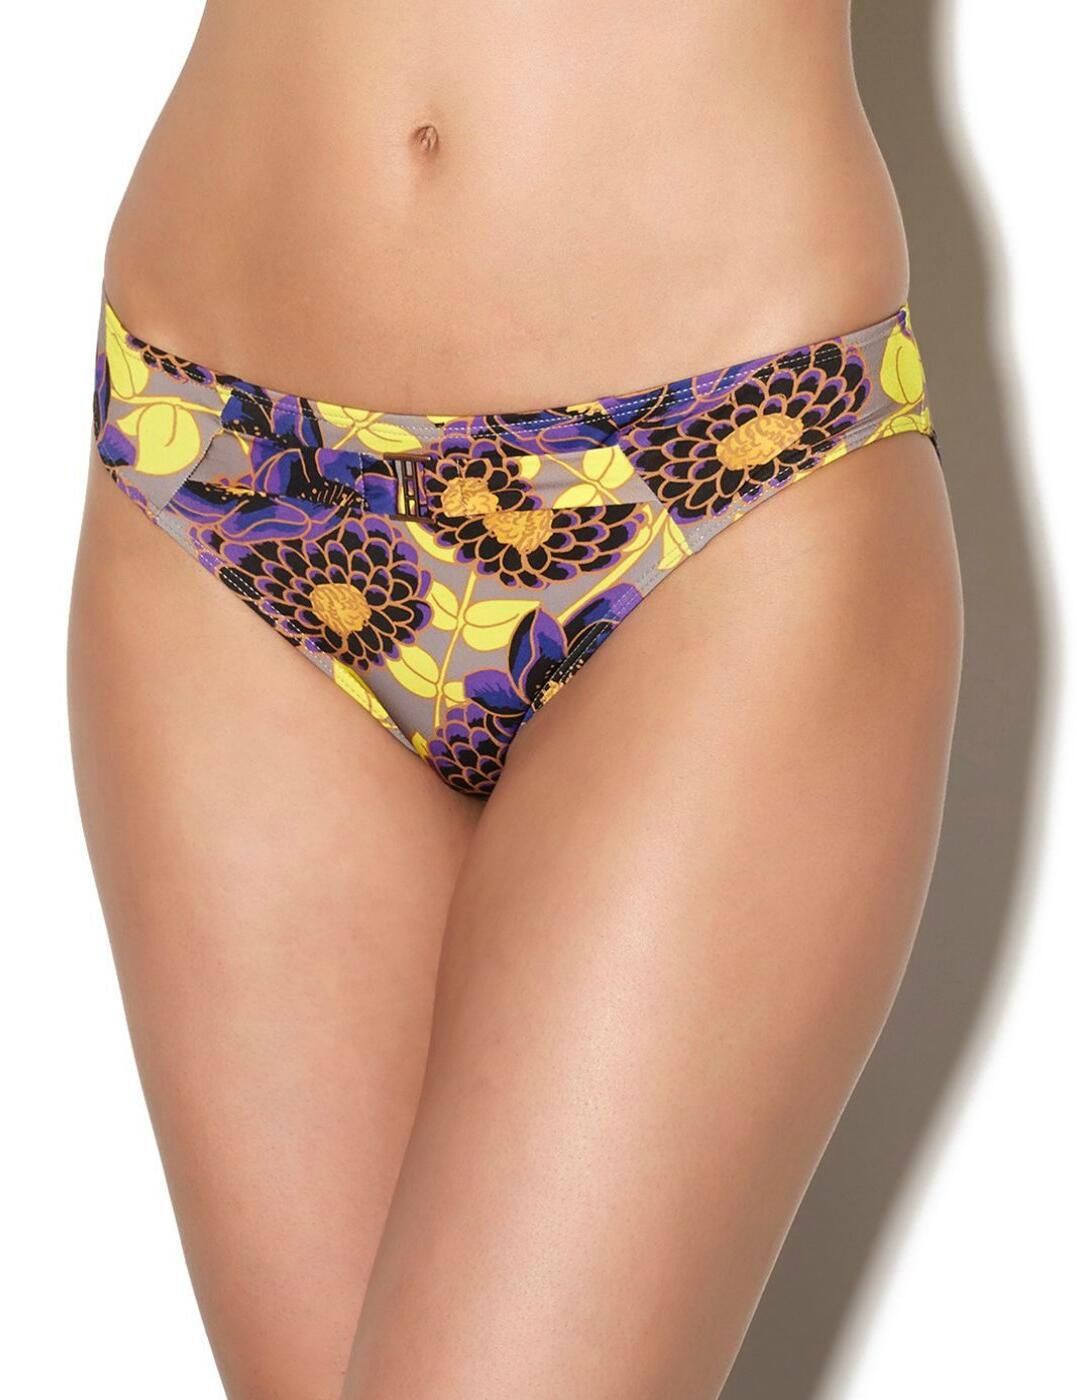 AJ22 Aubade Songe Tropical Brazilian Bikini Brief - AJ22 Granite